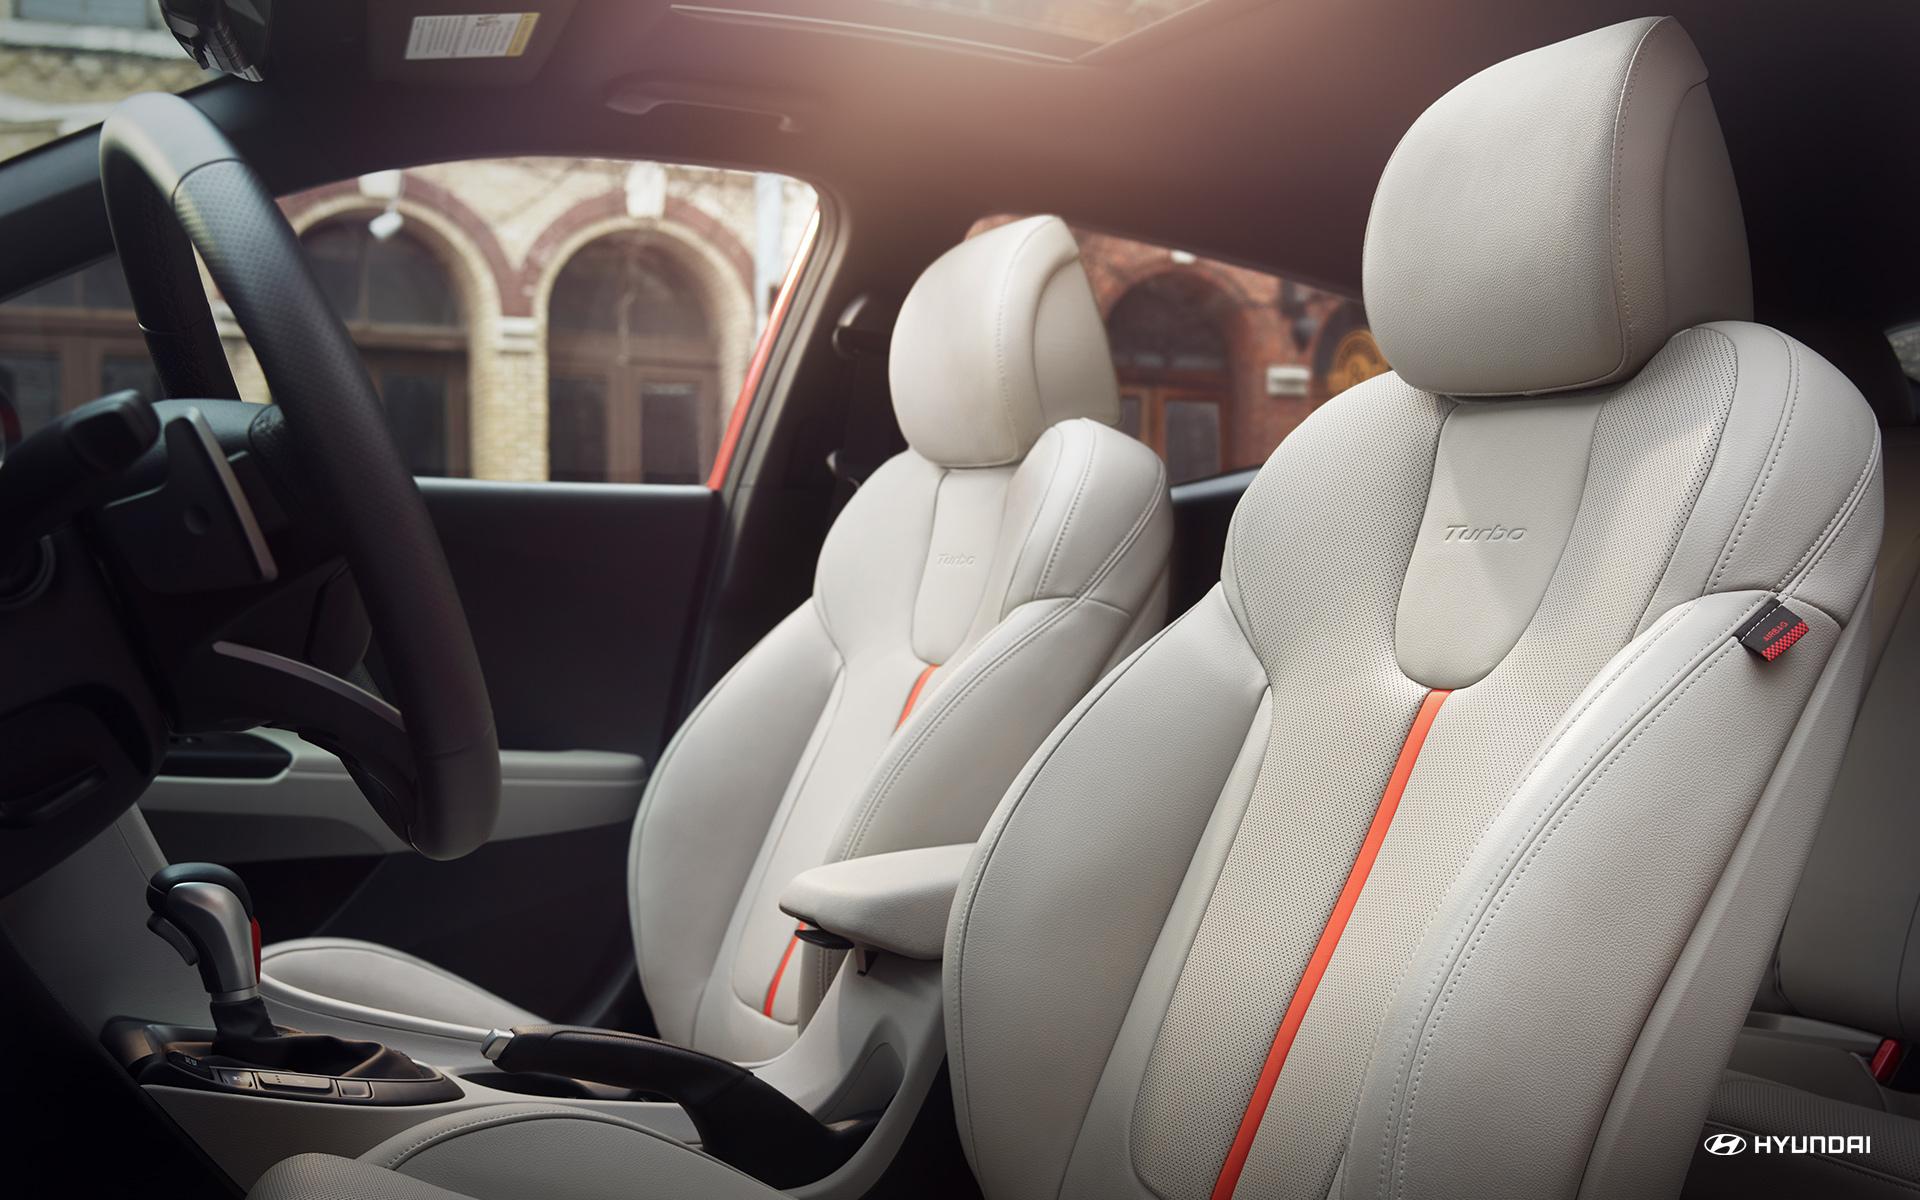 Cozy Interior of the 2019 Veloster Turbo